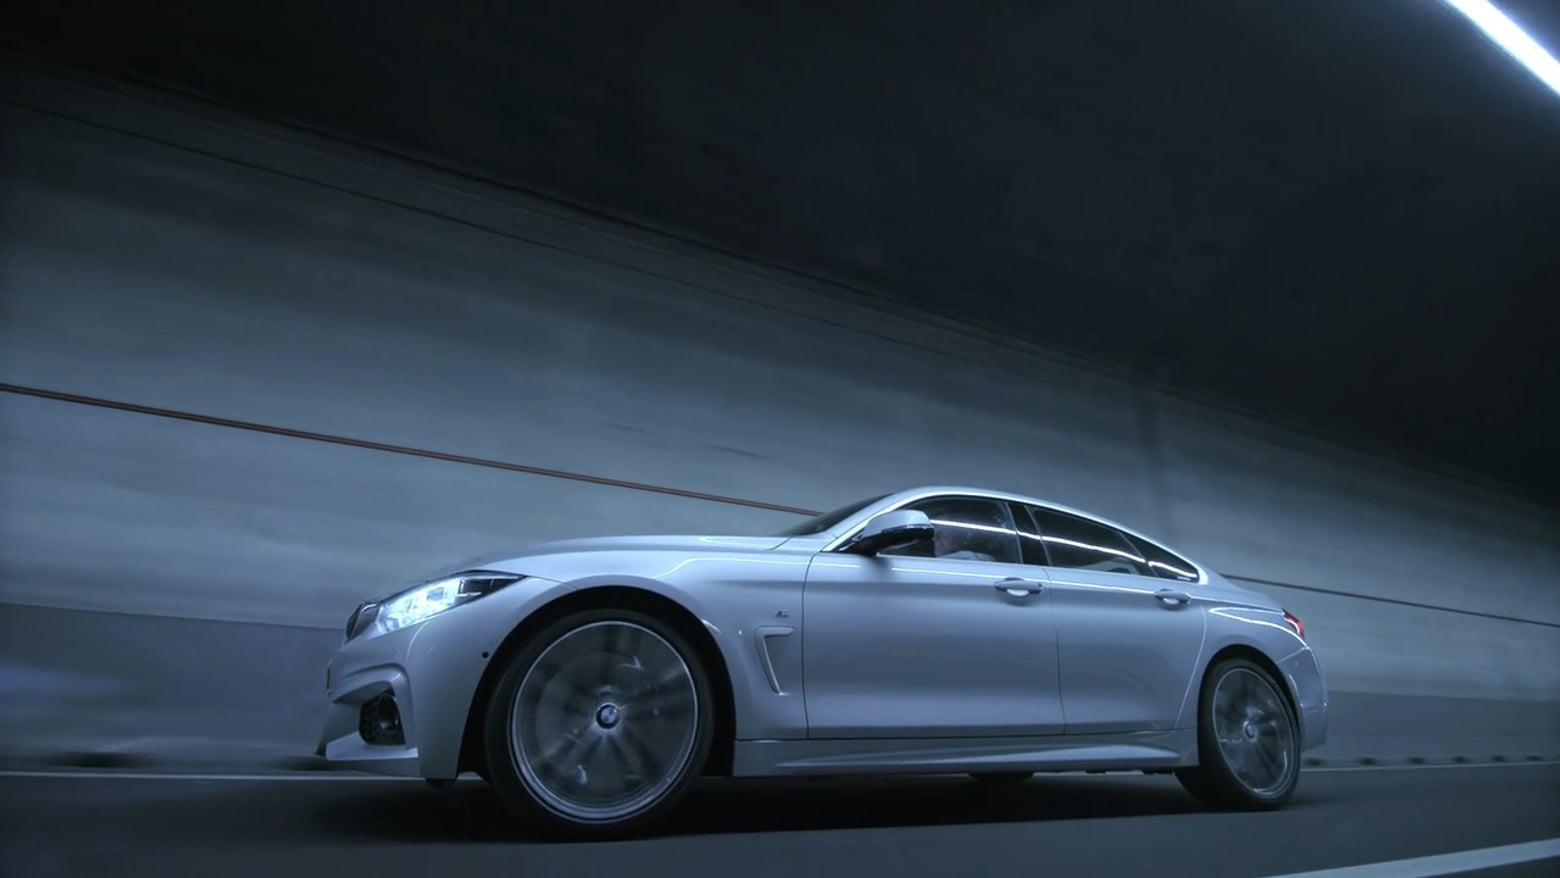 BMW rijplezier : TunnelLiefde - Rob Hodselmans Cinematographer